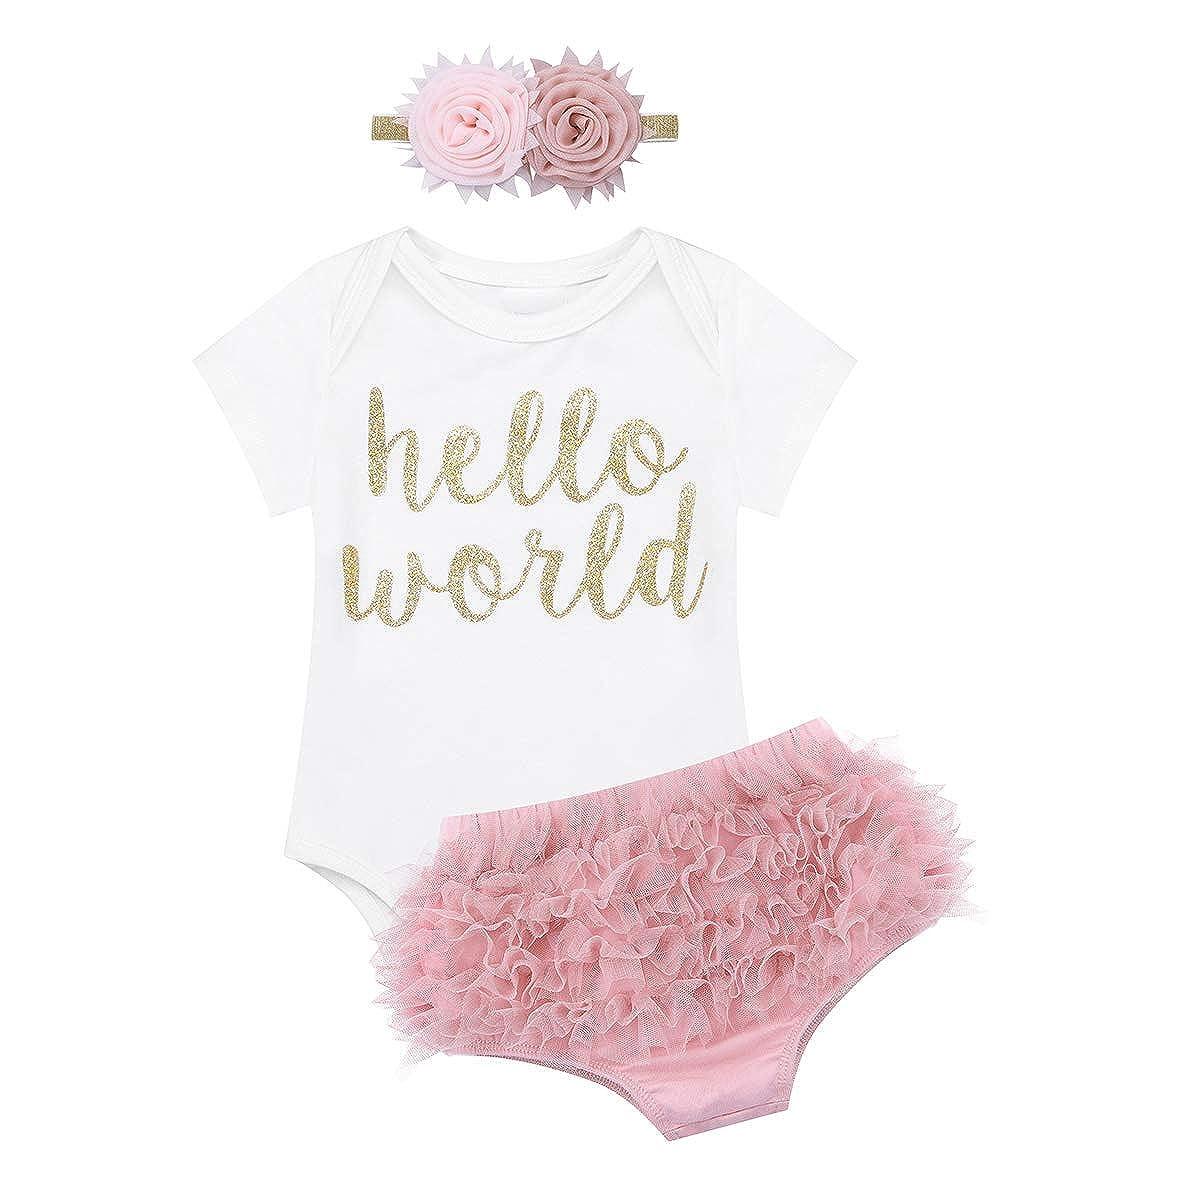 YiZYiF 3PCS Newborn Baby Girl's Hello World Birthday Flower Ruffles Bodysuits Coming Home Outfit Set